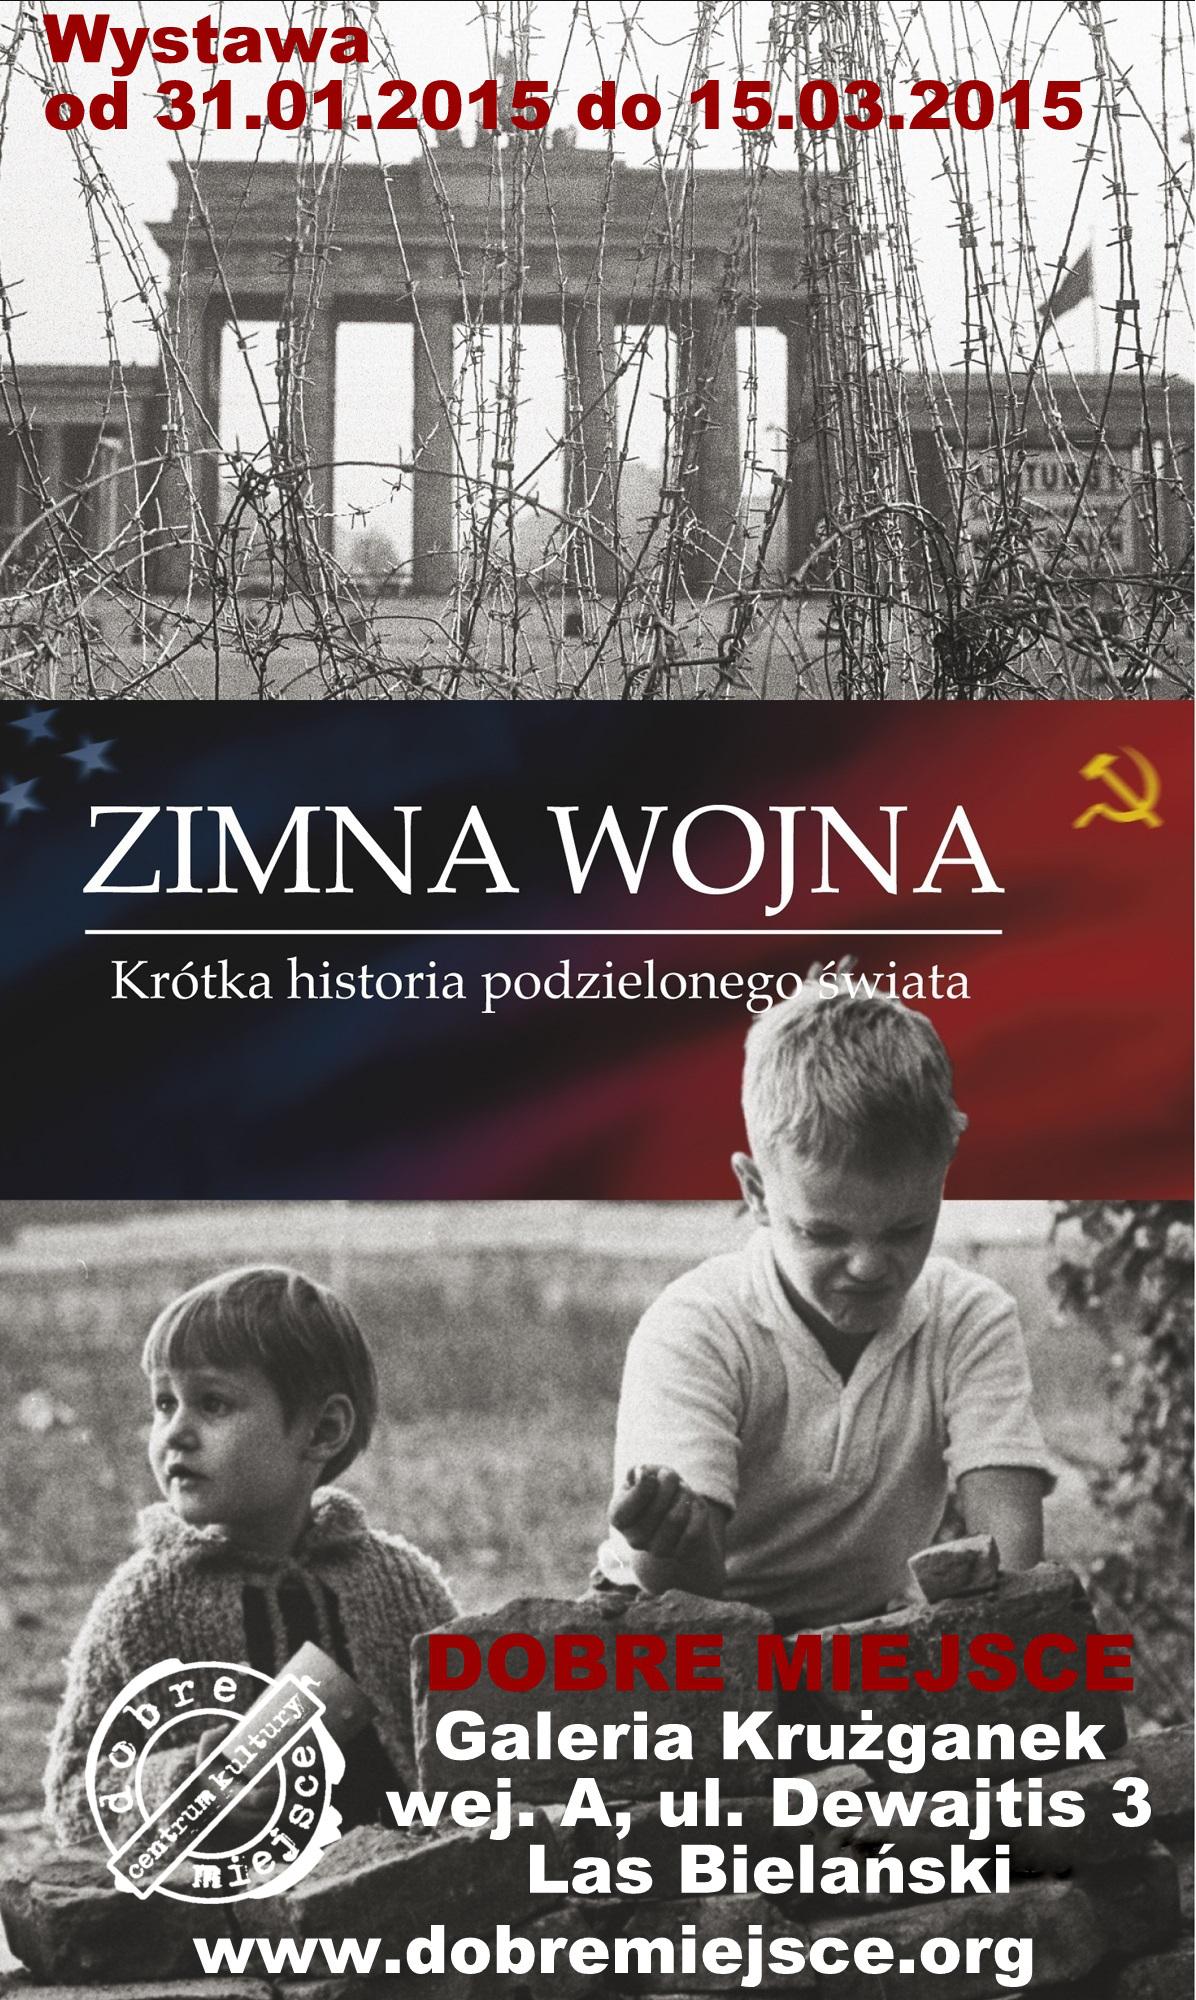 zimna_wojna_plakat1full